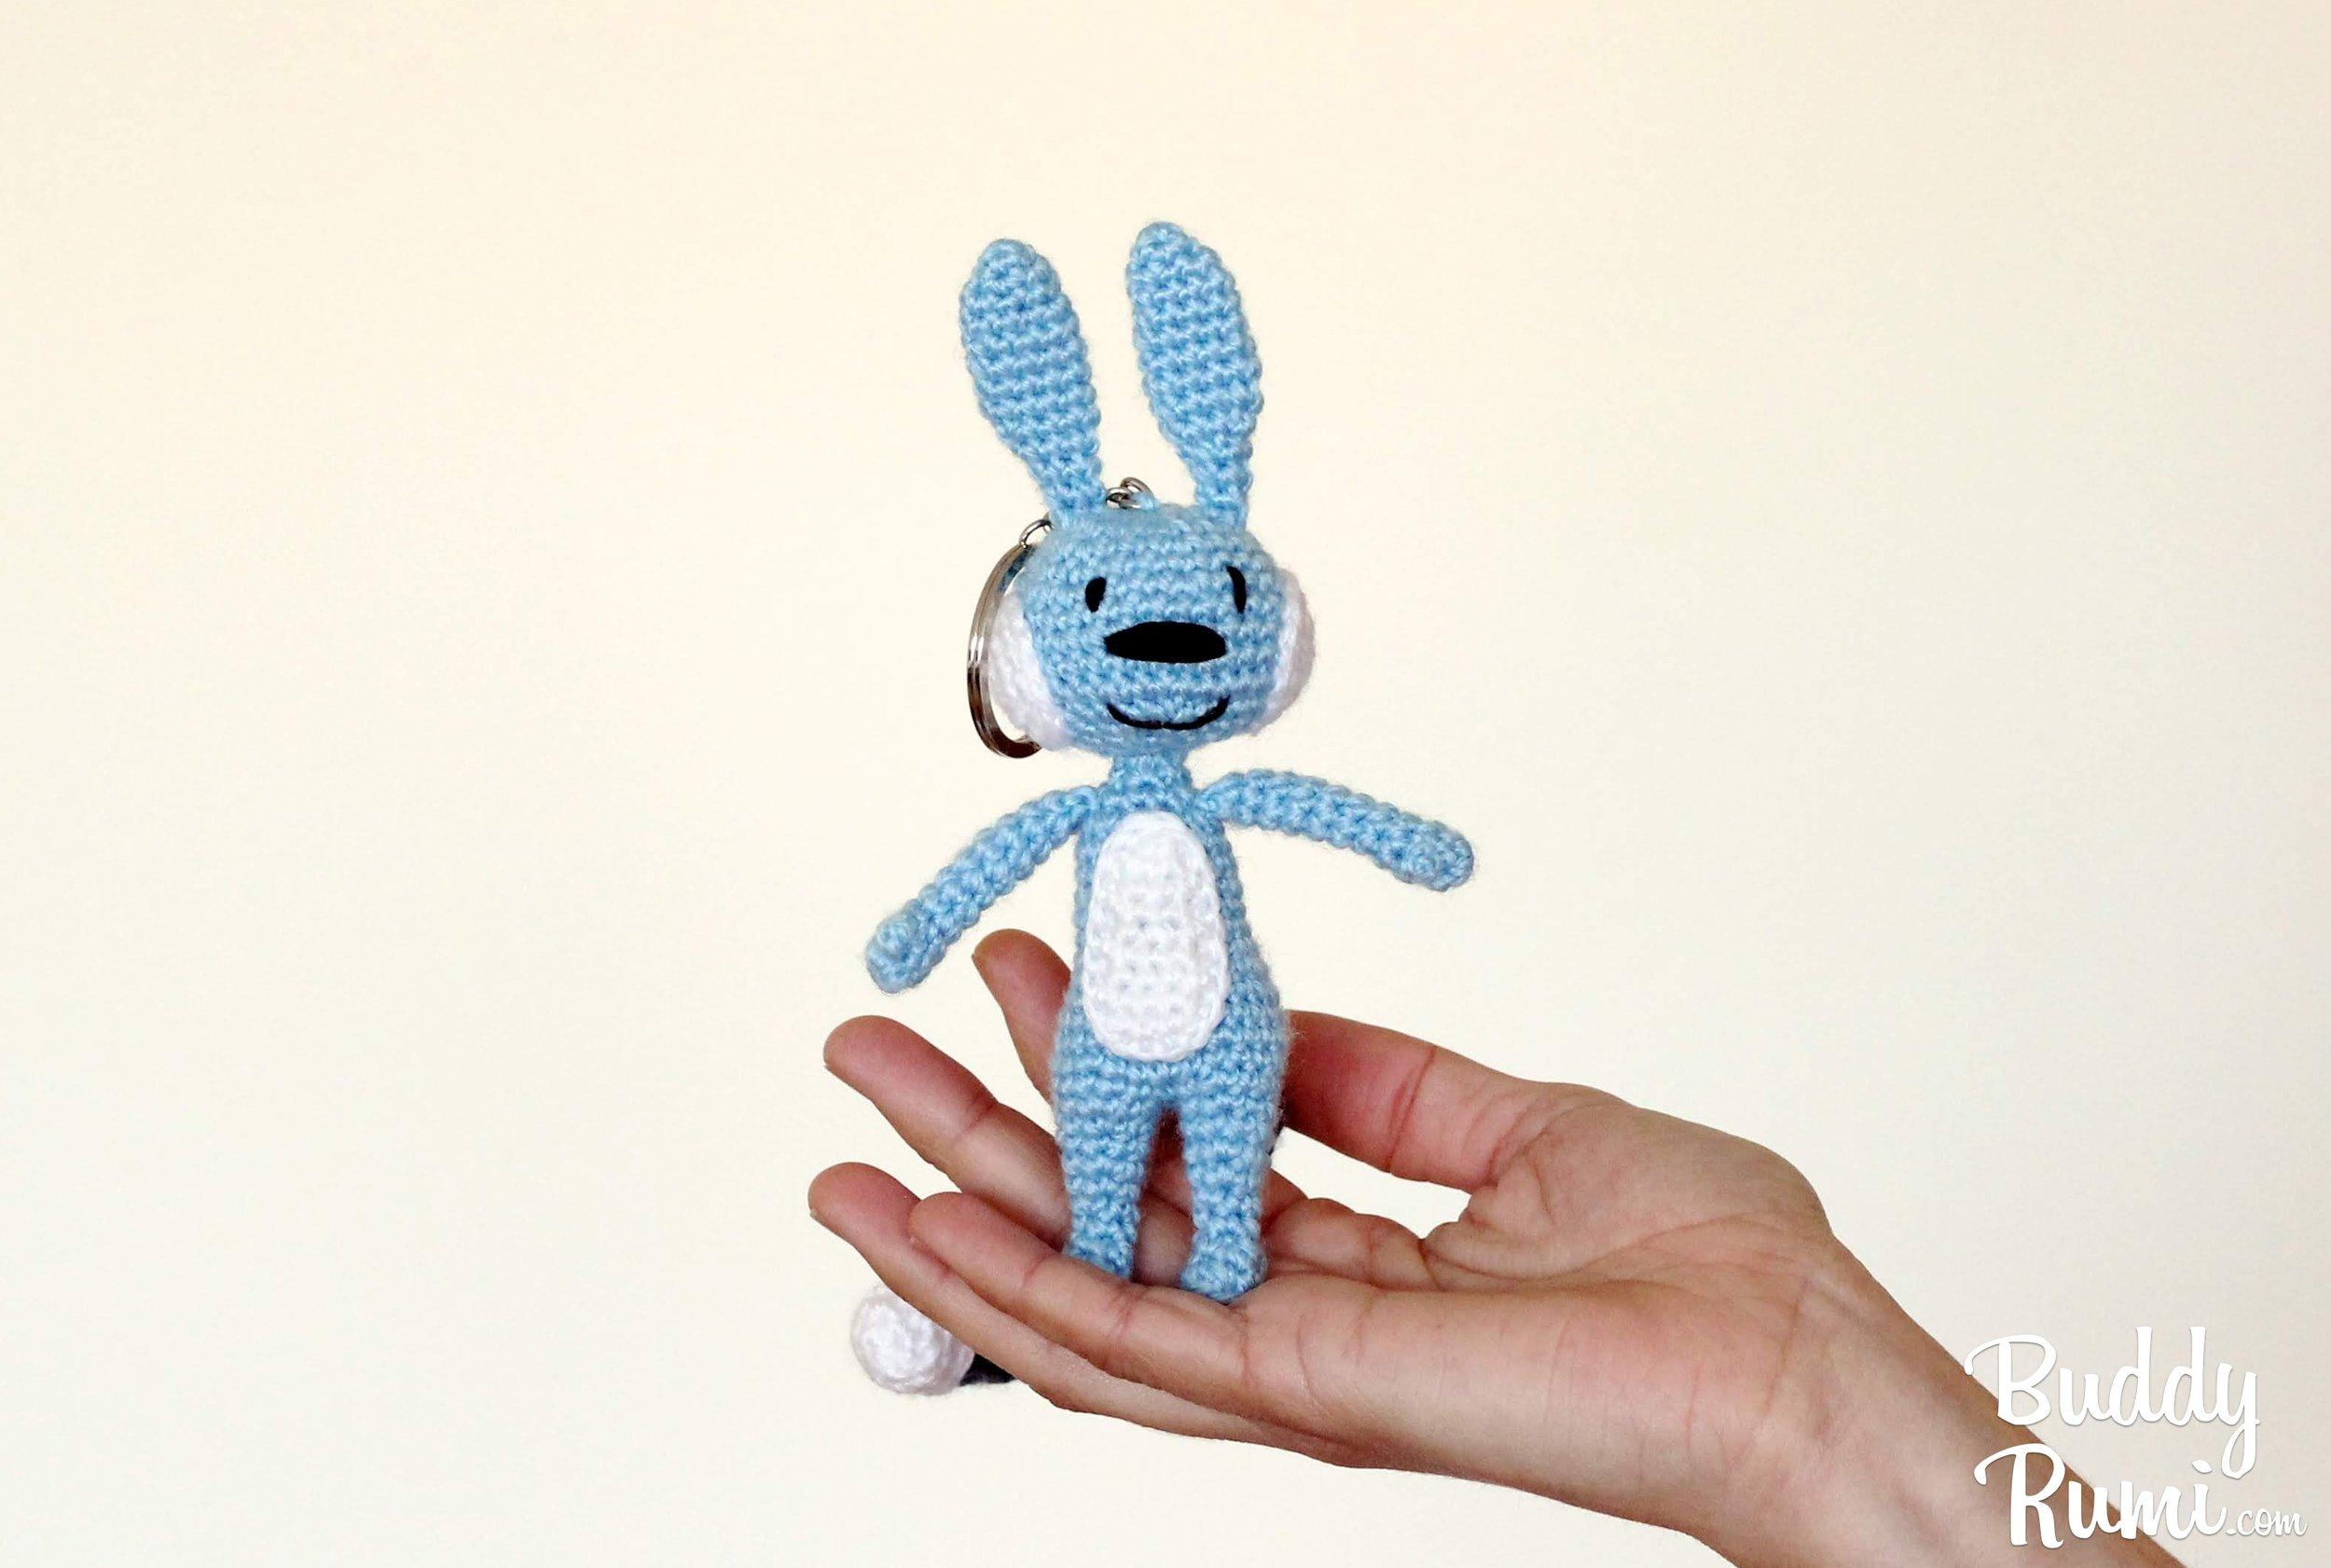 Blue amigurumi rabbit pattern